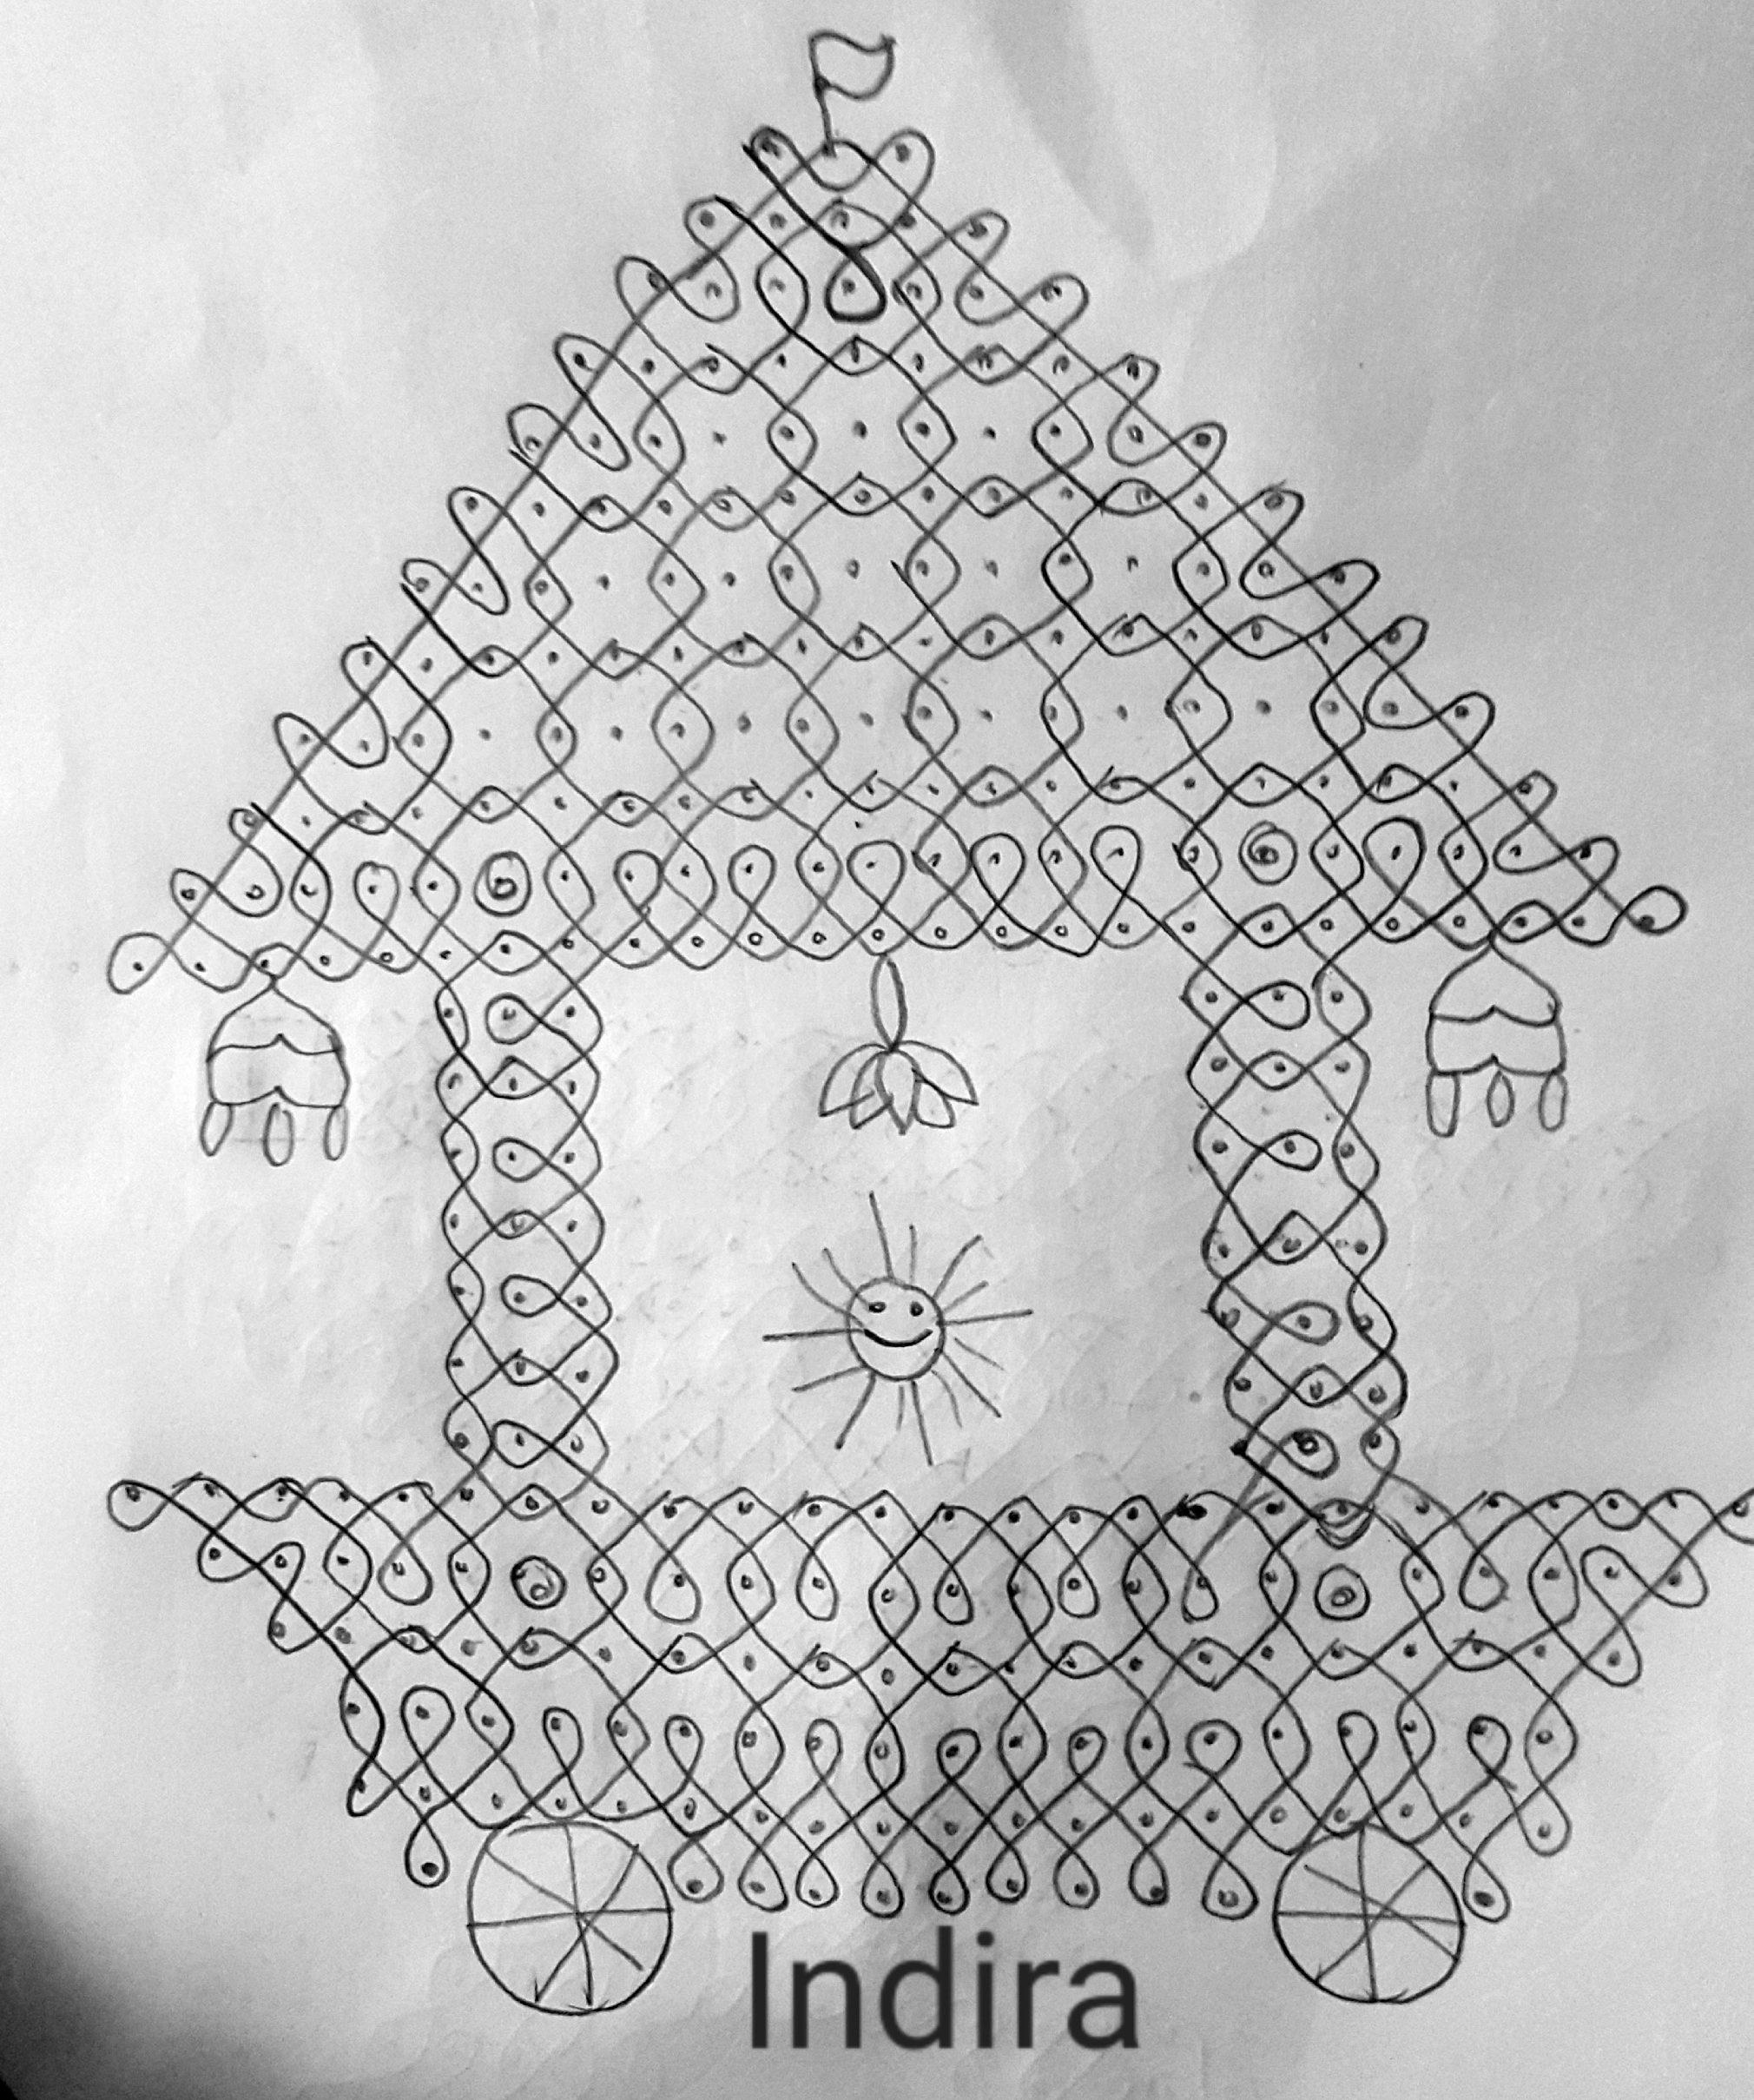 25 dots Ther Kolam || Ratha Muggulu || 25 dots contest kolam